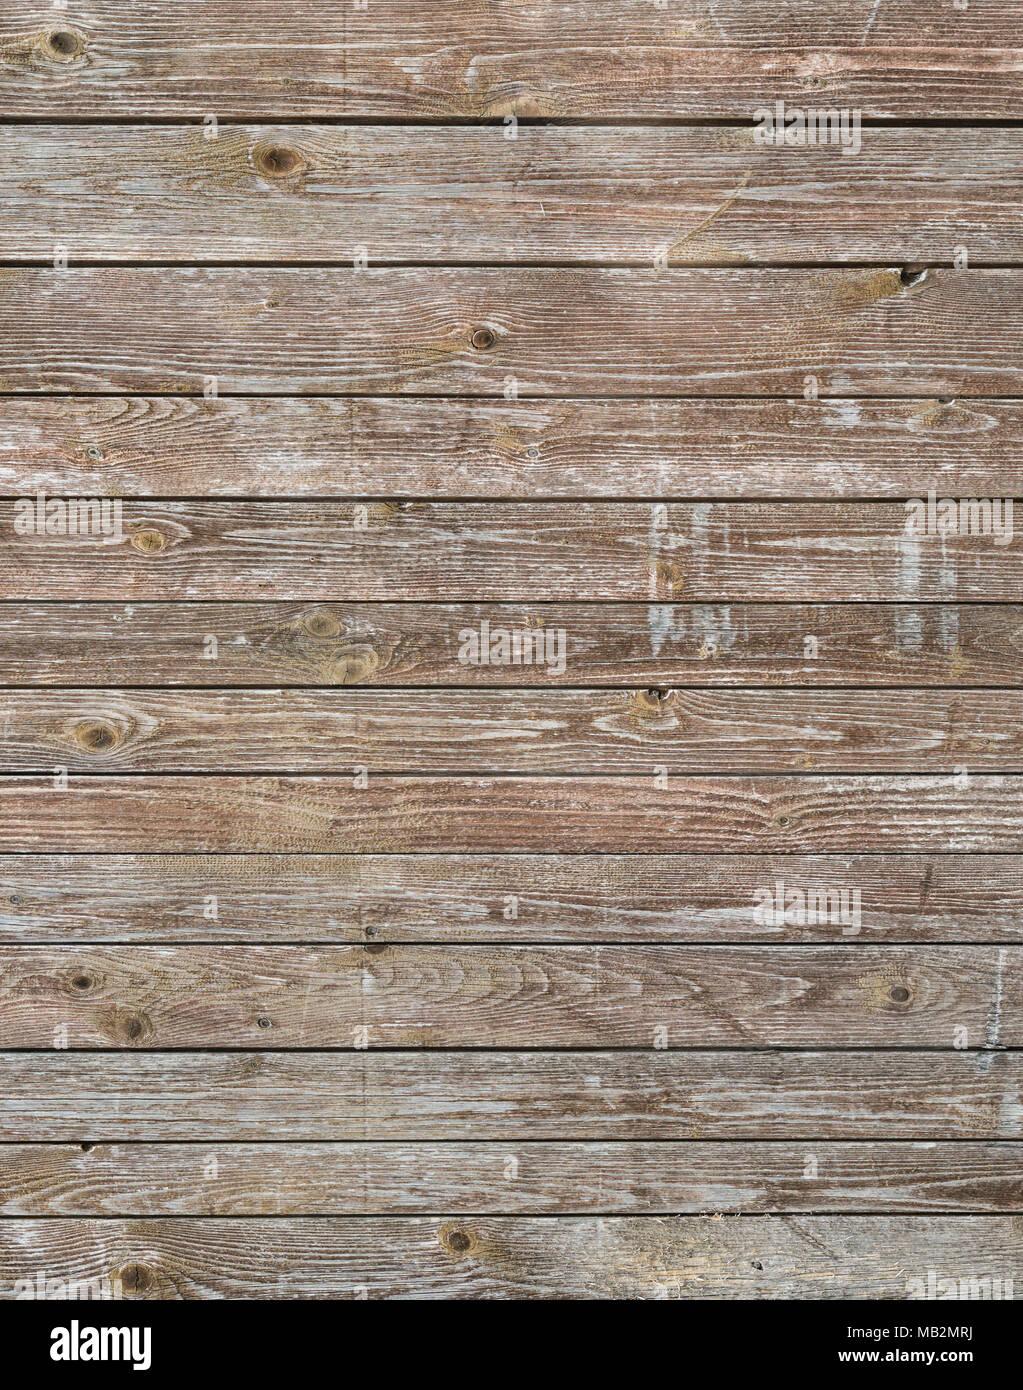 Natural Brown Barn Wood Wall Wall Texture Background Pattern Wood